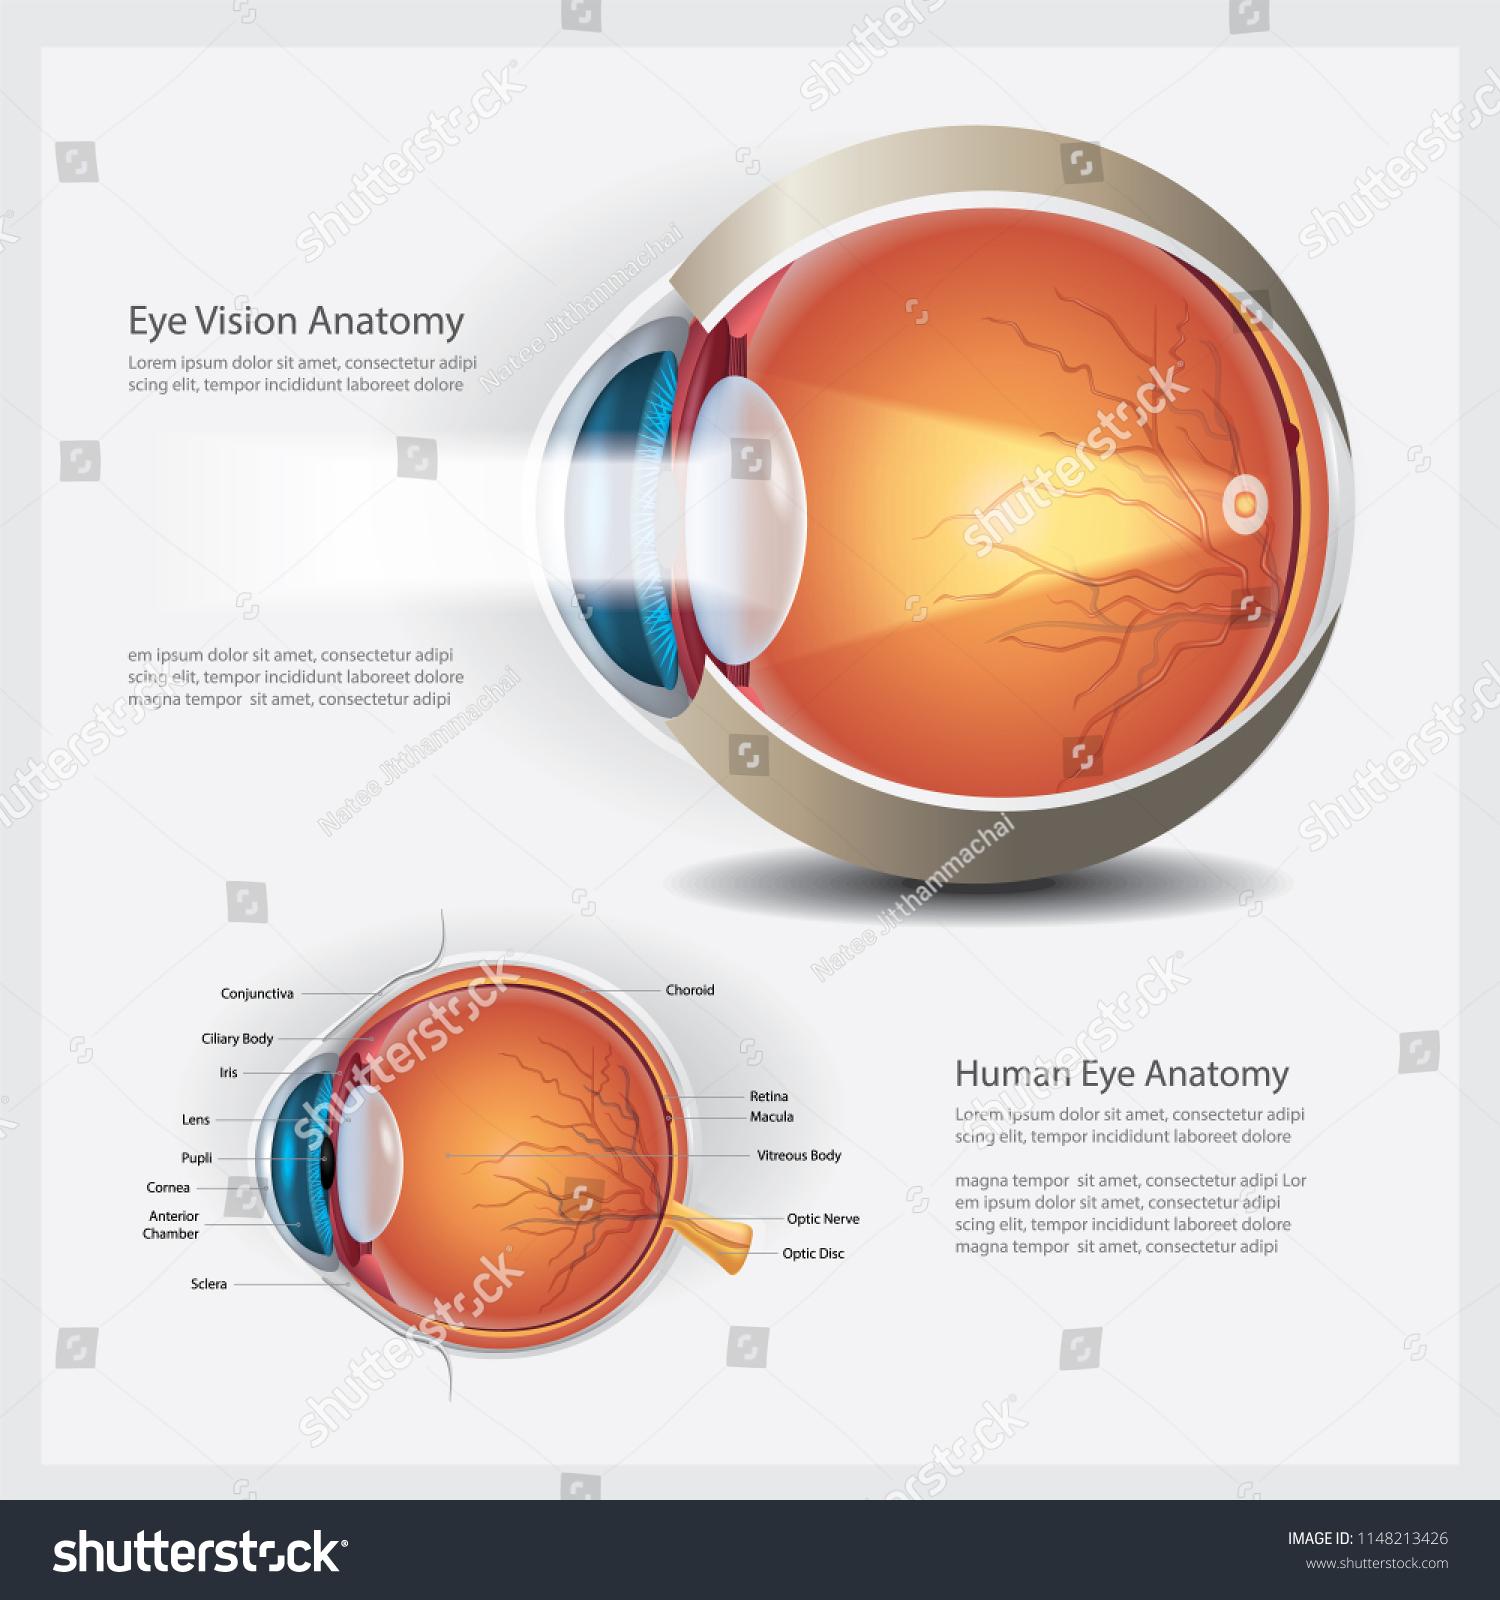 Human Eye Vision Anatomy Vector Illustration Stock Vector (Royalty ...